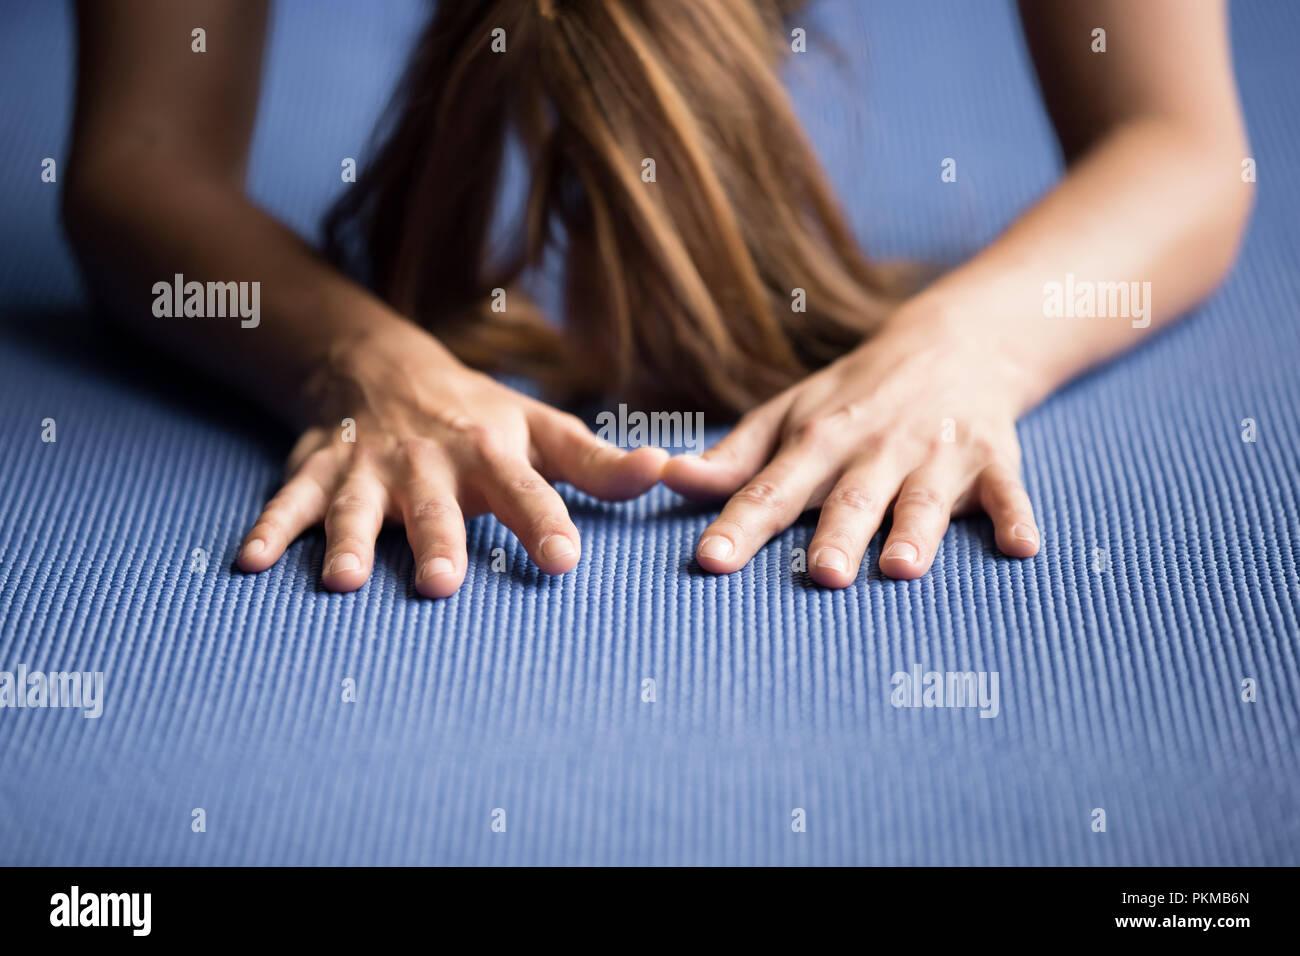 Sporty woman practicing yoga sur un tapis bleu Photo Stock